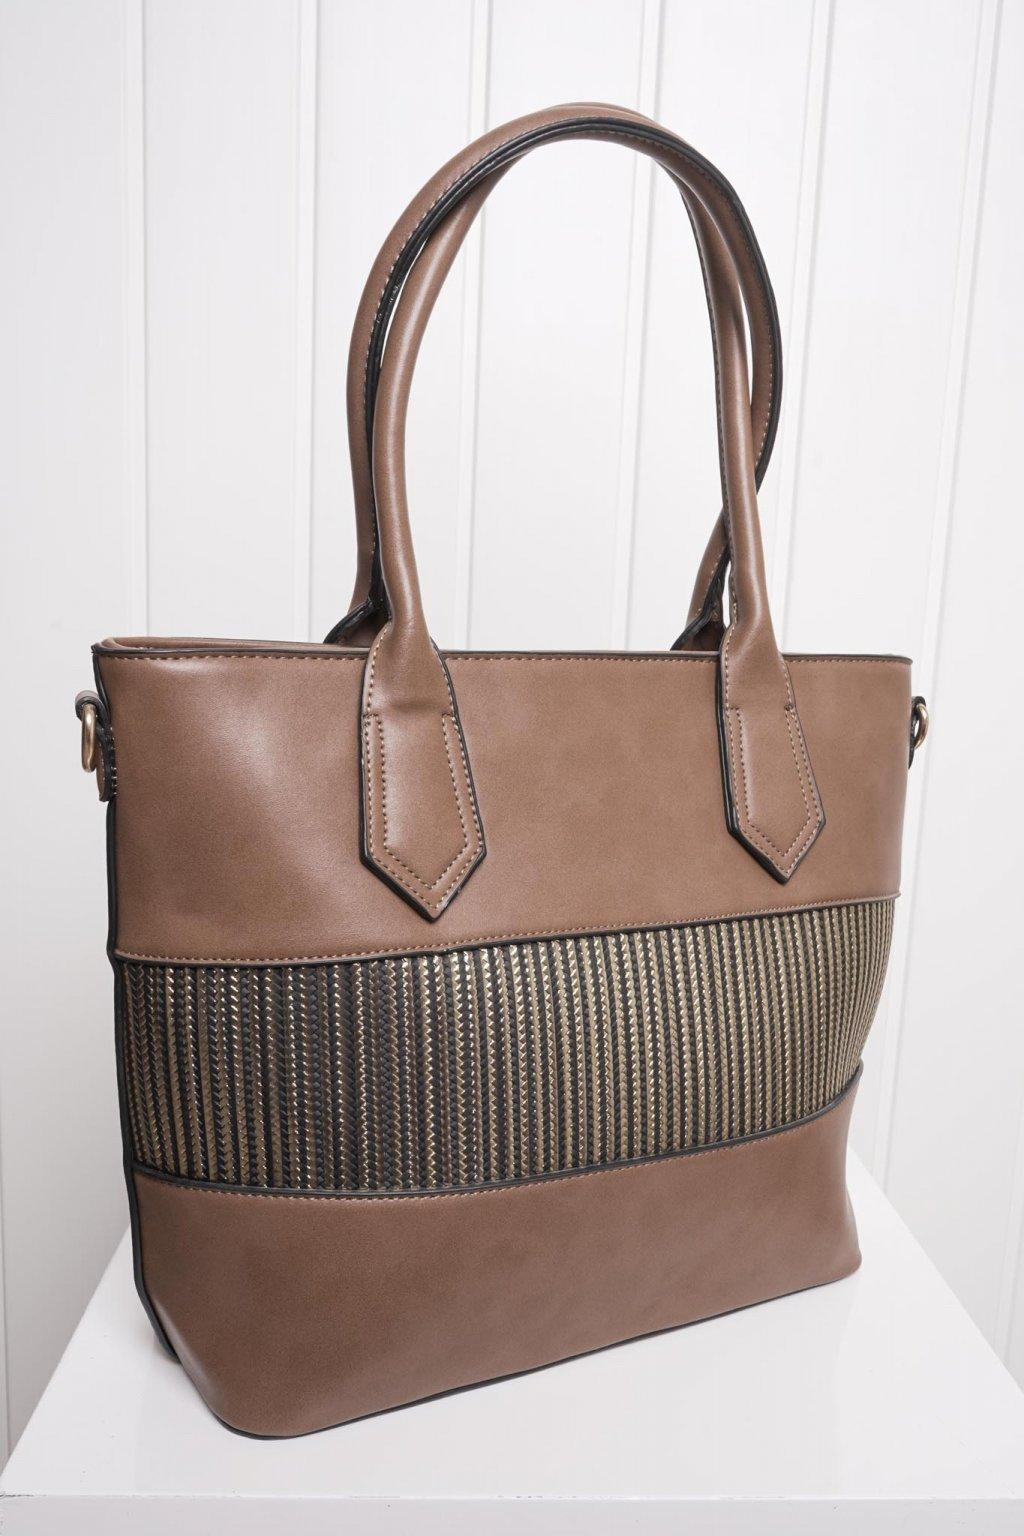 Kabelka, ruksak, dobrá cena, čierna kabelka, čierny ruksak, basic, kabelky, ruksaky 100